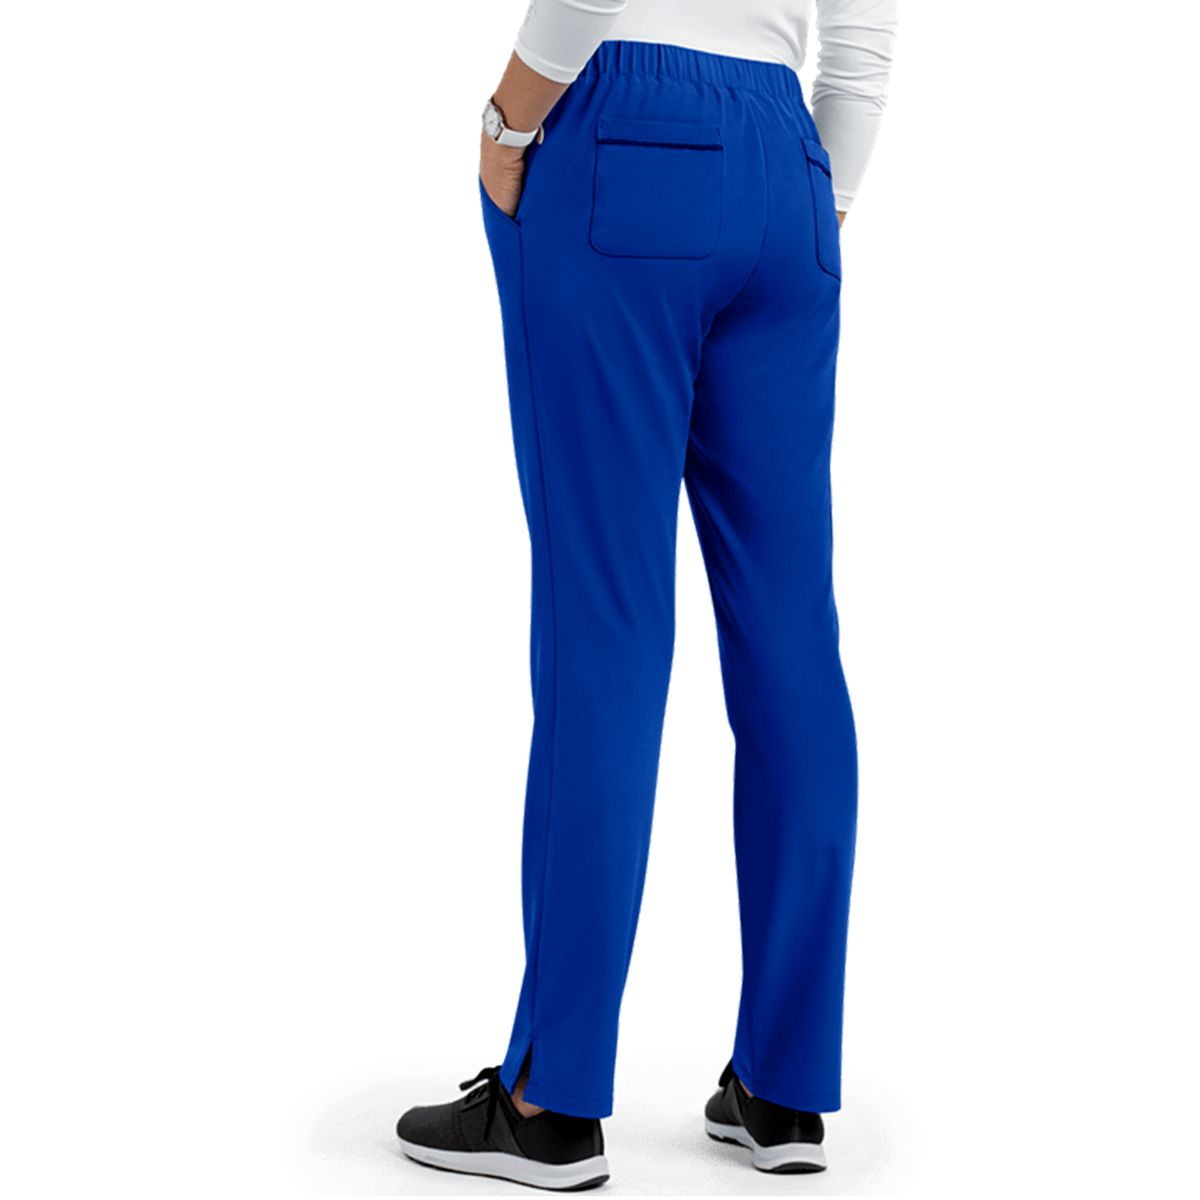 Pantalon Clinico Tens Mujer Azul Rey Matrix Impulse 8510 Shopsale Uniformes